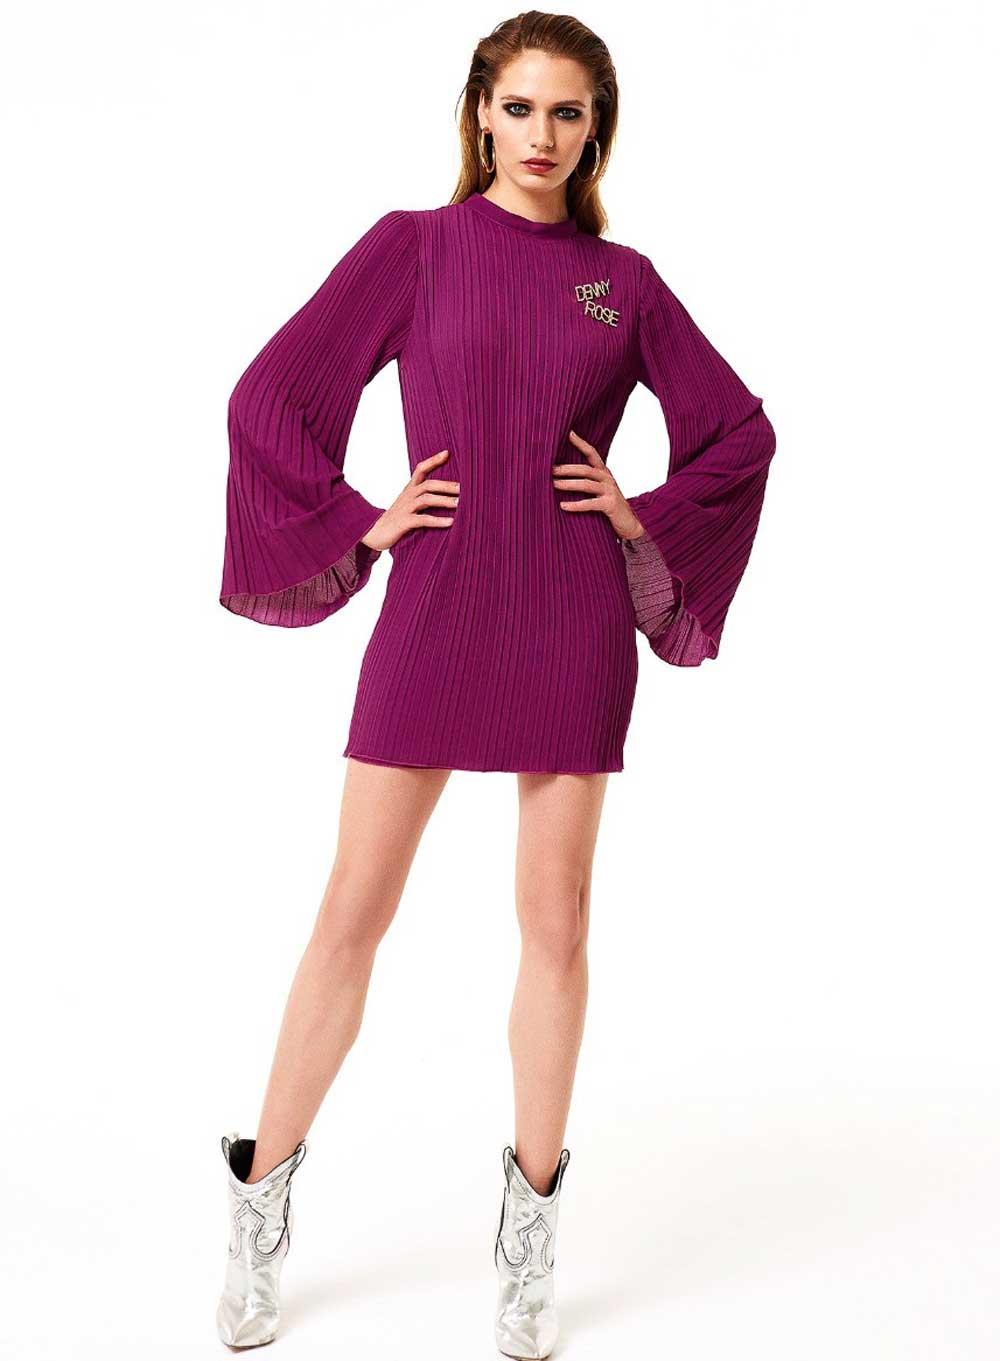 Colores de moda púrpura invierno 2021